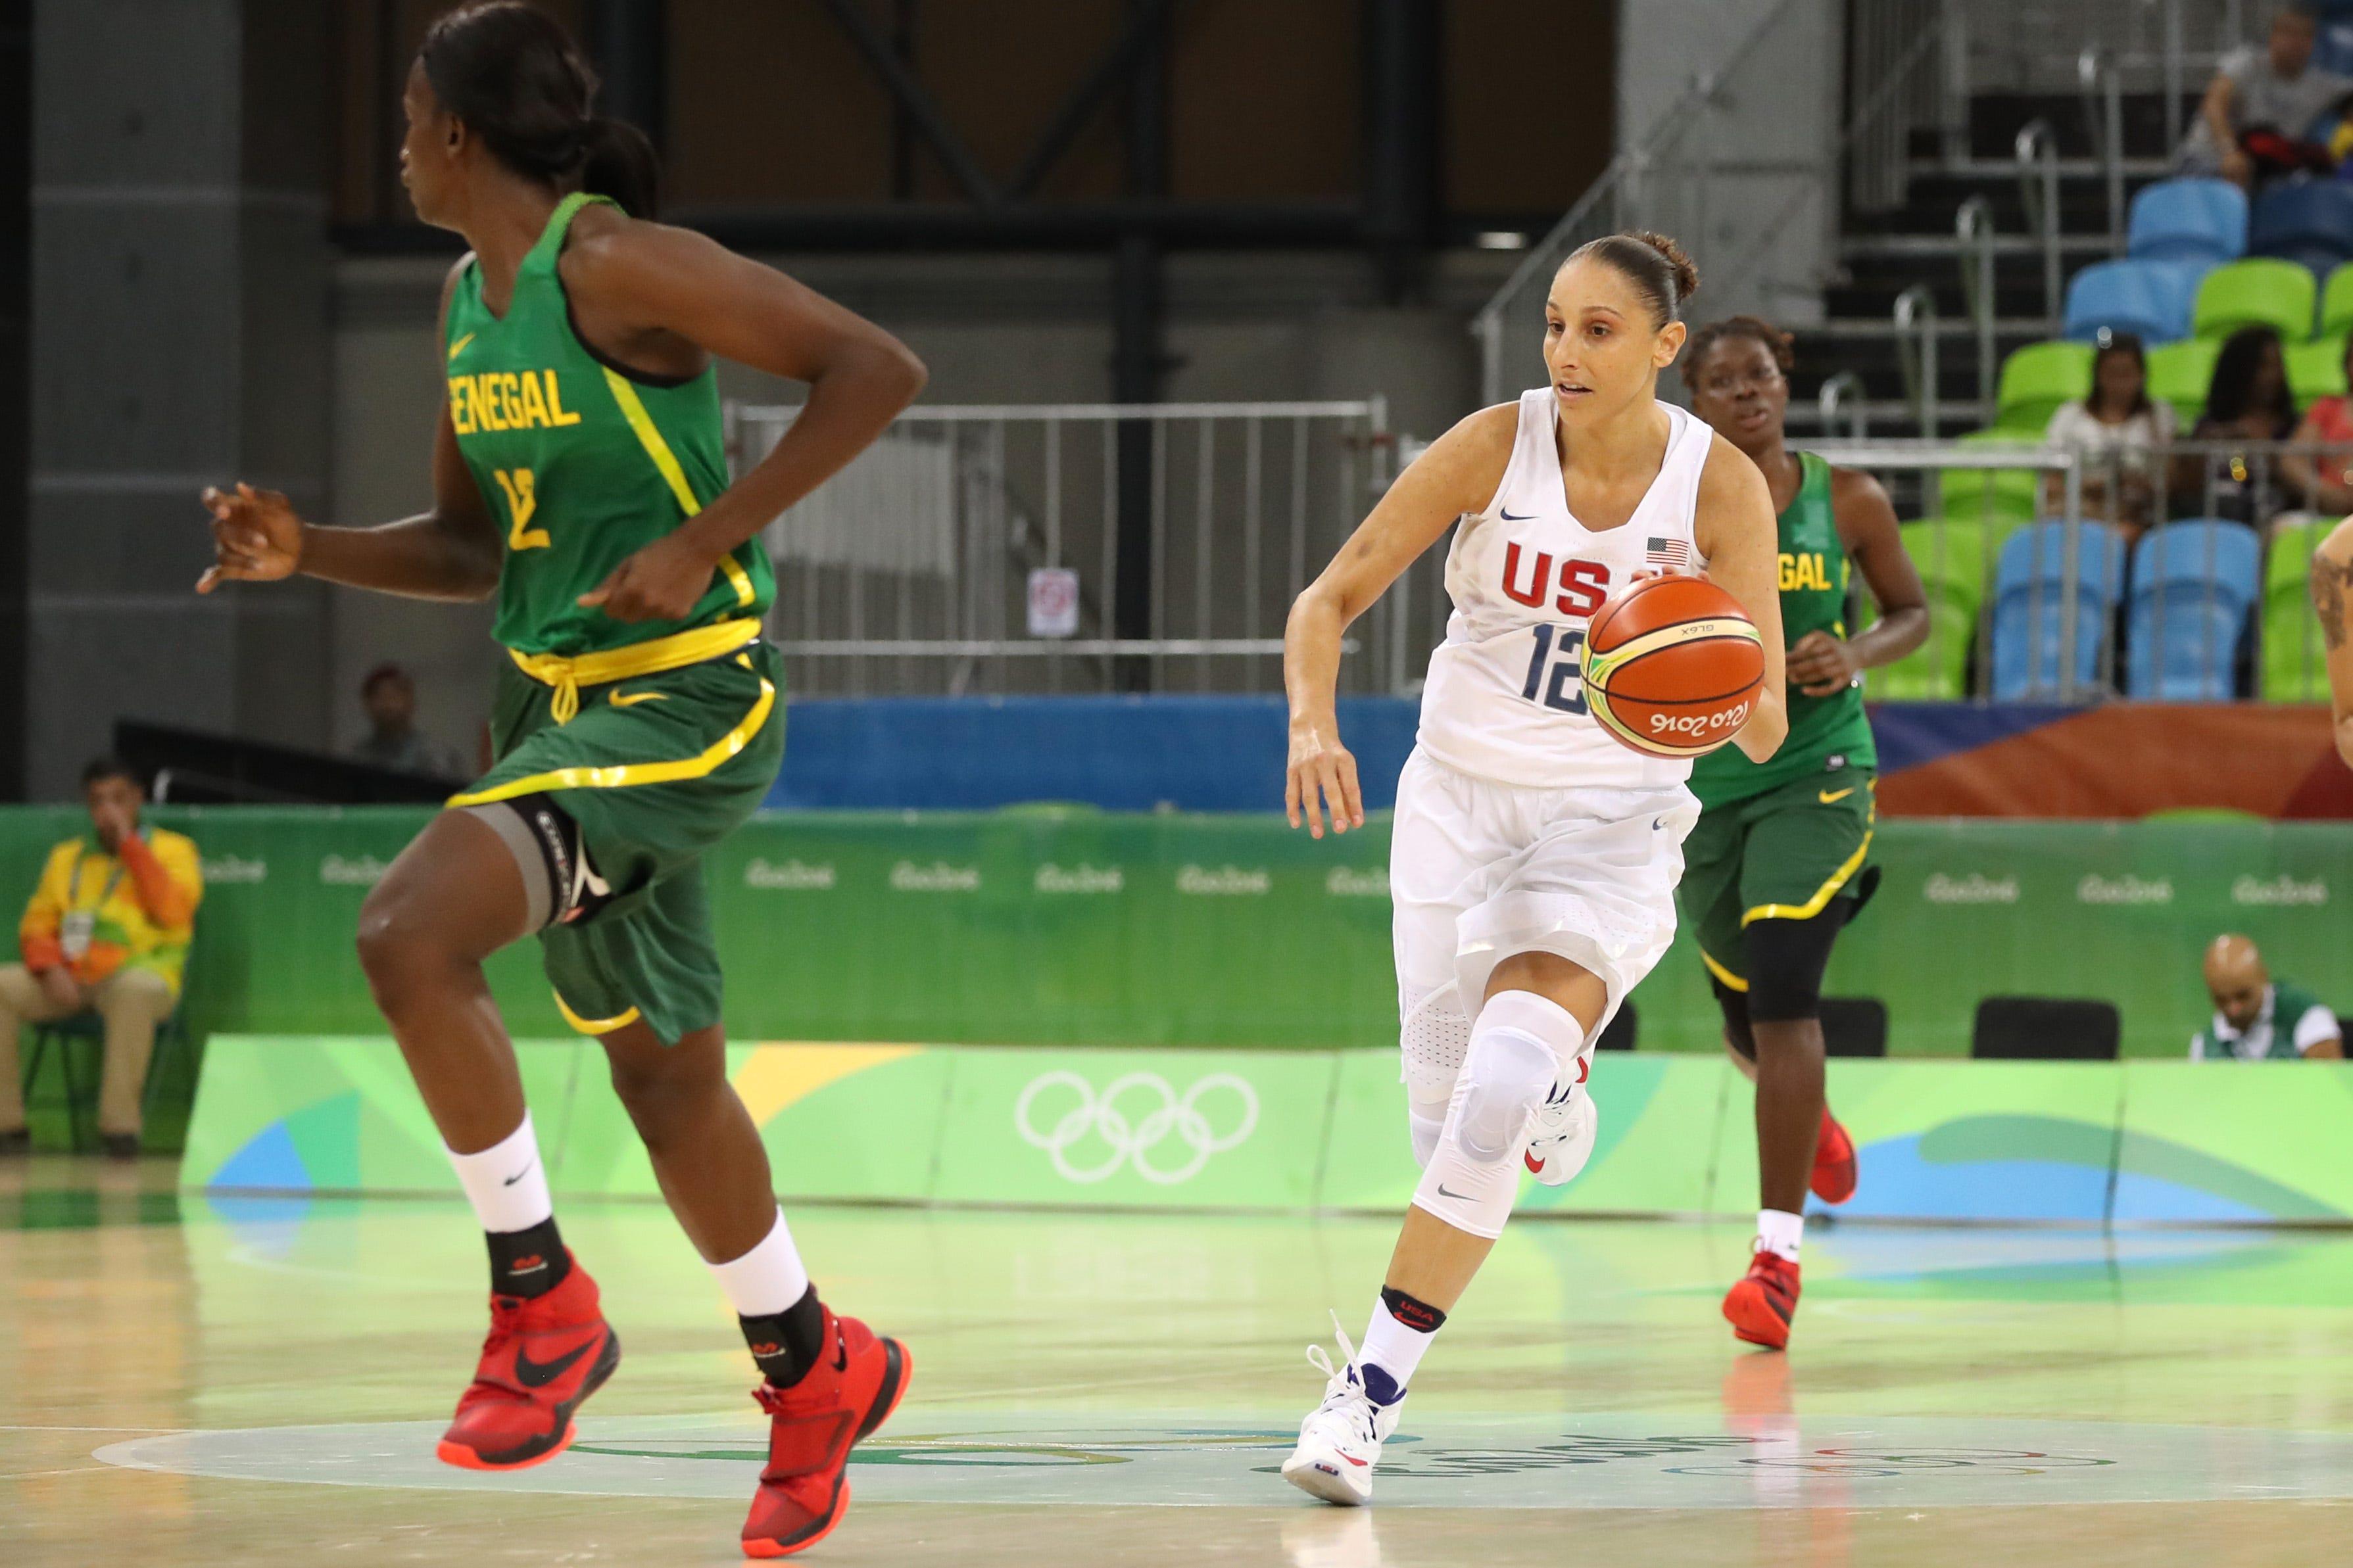 U.S. Olympic women's basketball coach Dawn Staley 'not nervous' over Diana Taurasi injury